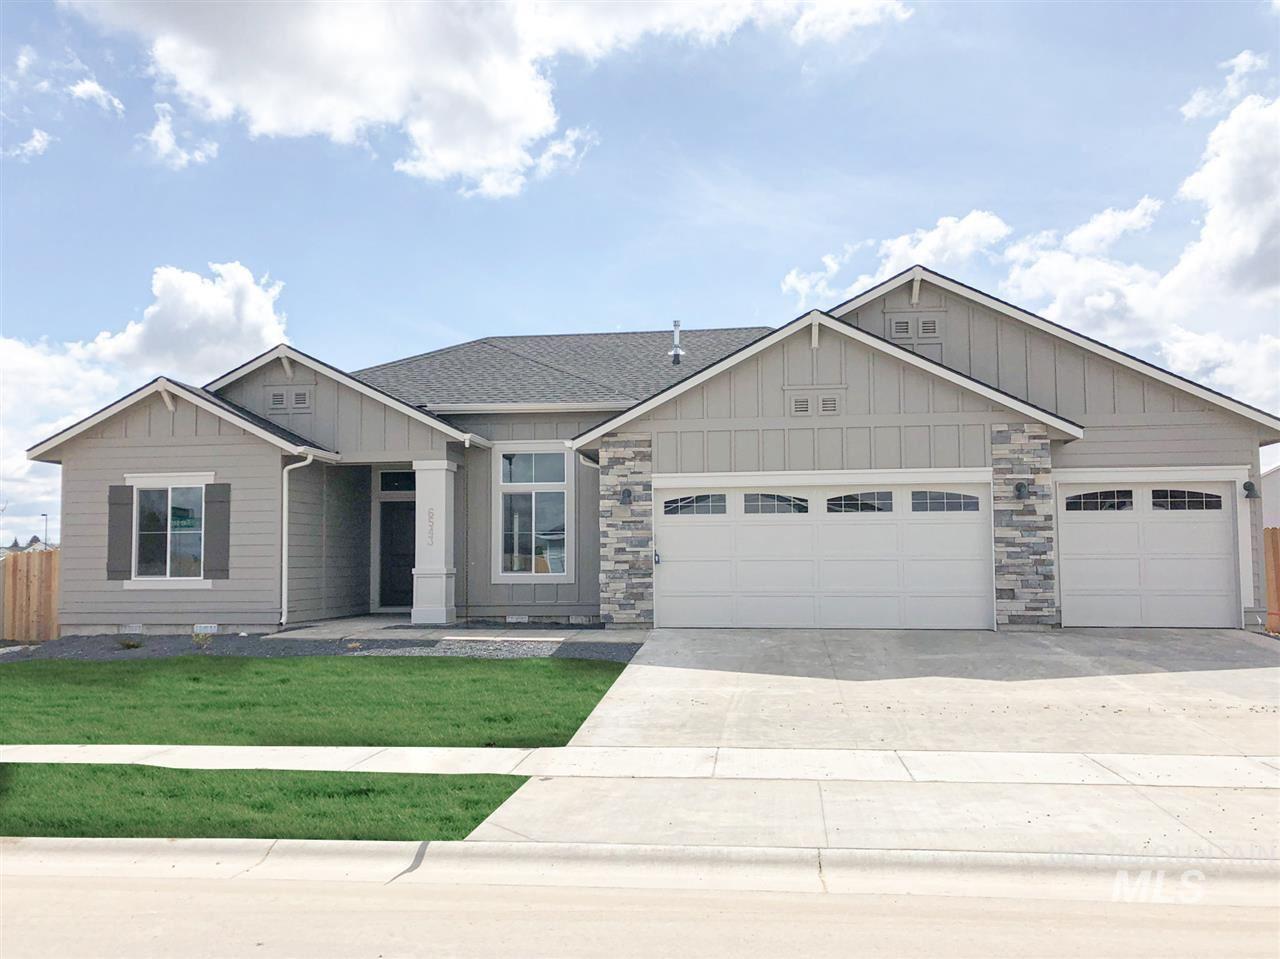 6543 E Benson St., Nampa, ID 83687 - MLS#: 98761678